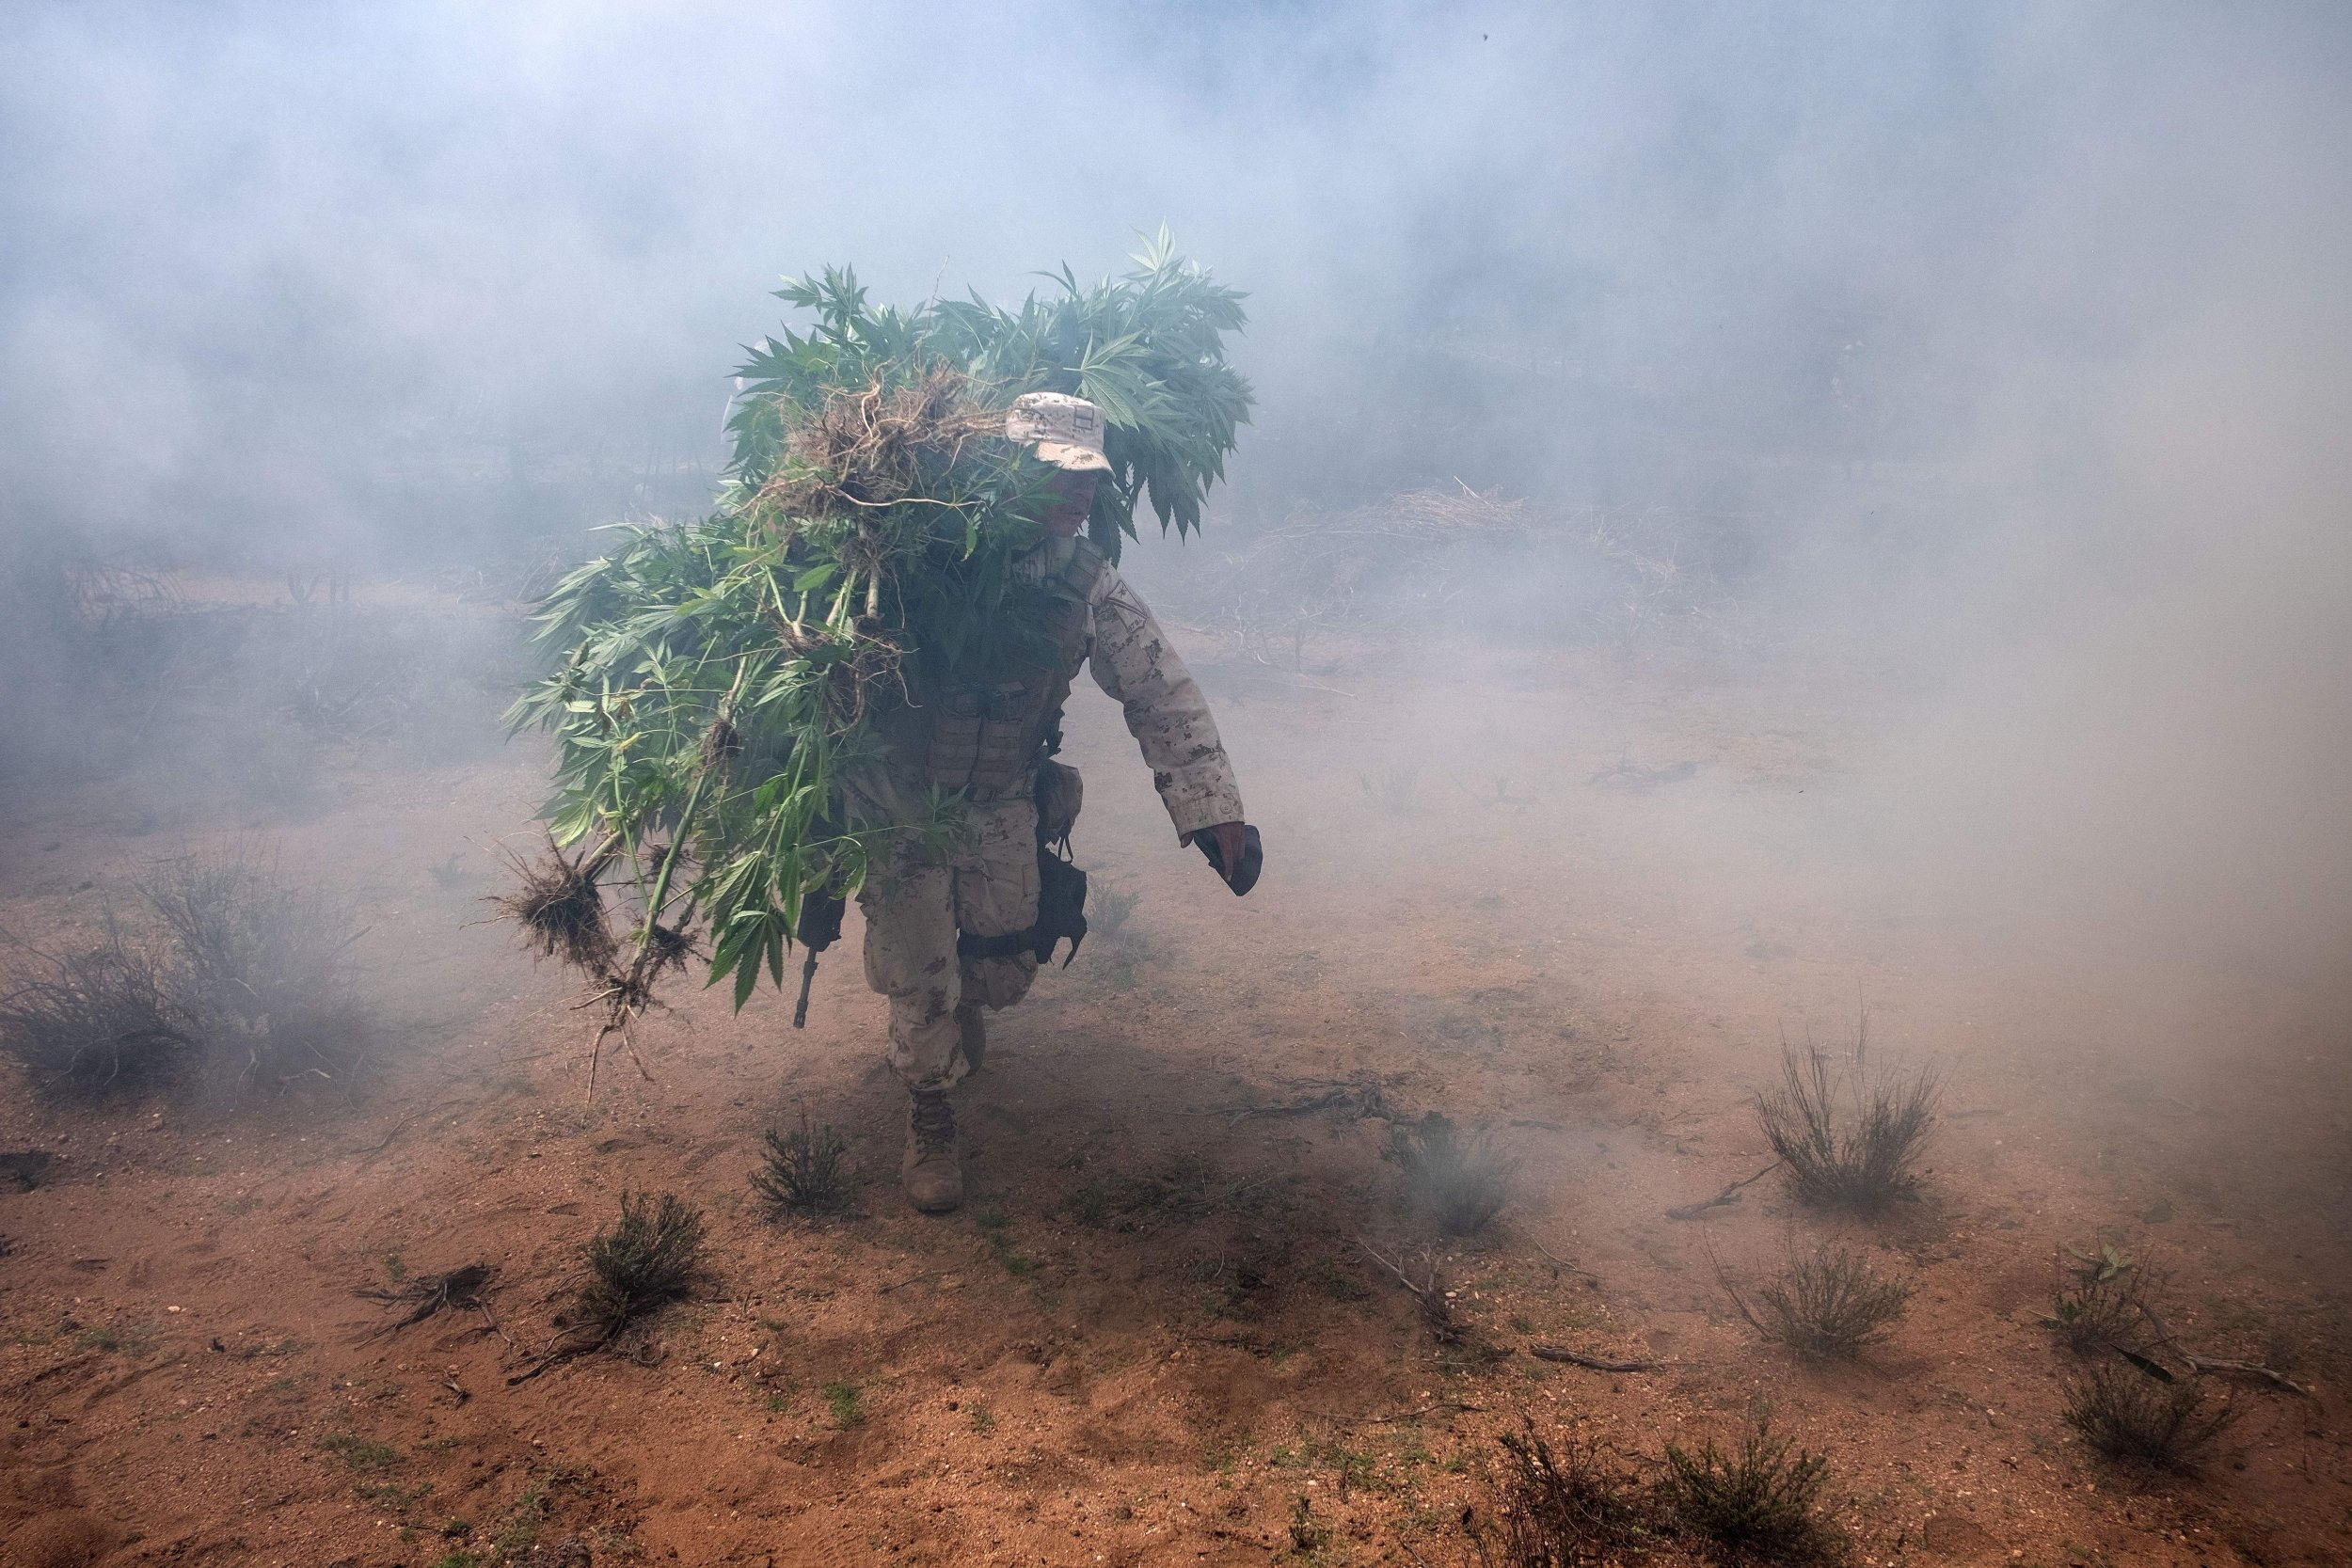 11_9_Weed burning Mexico